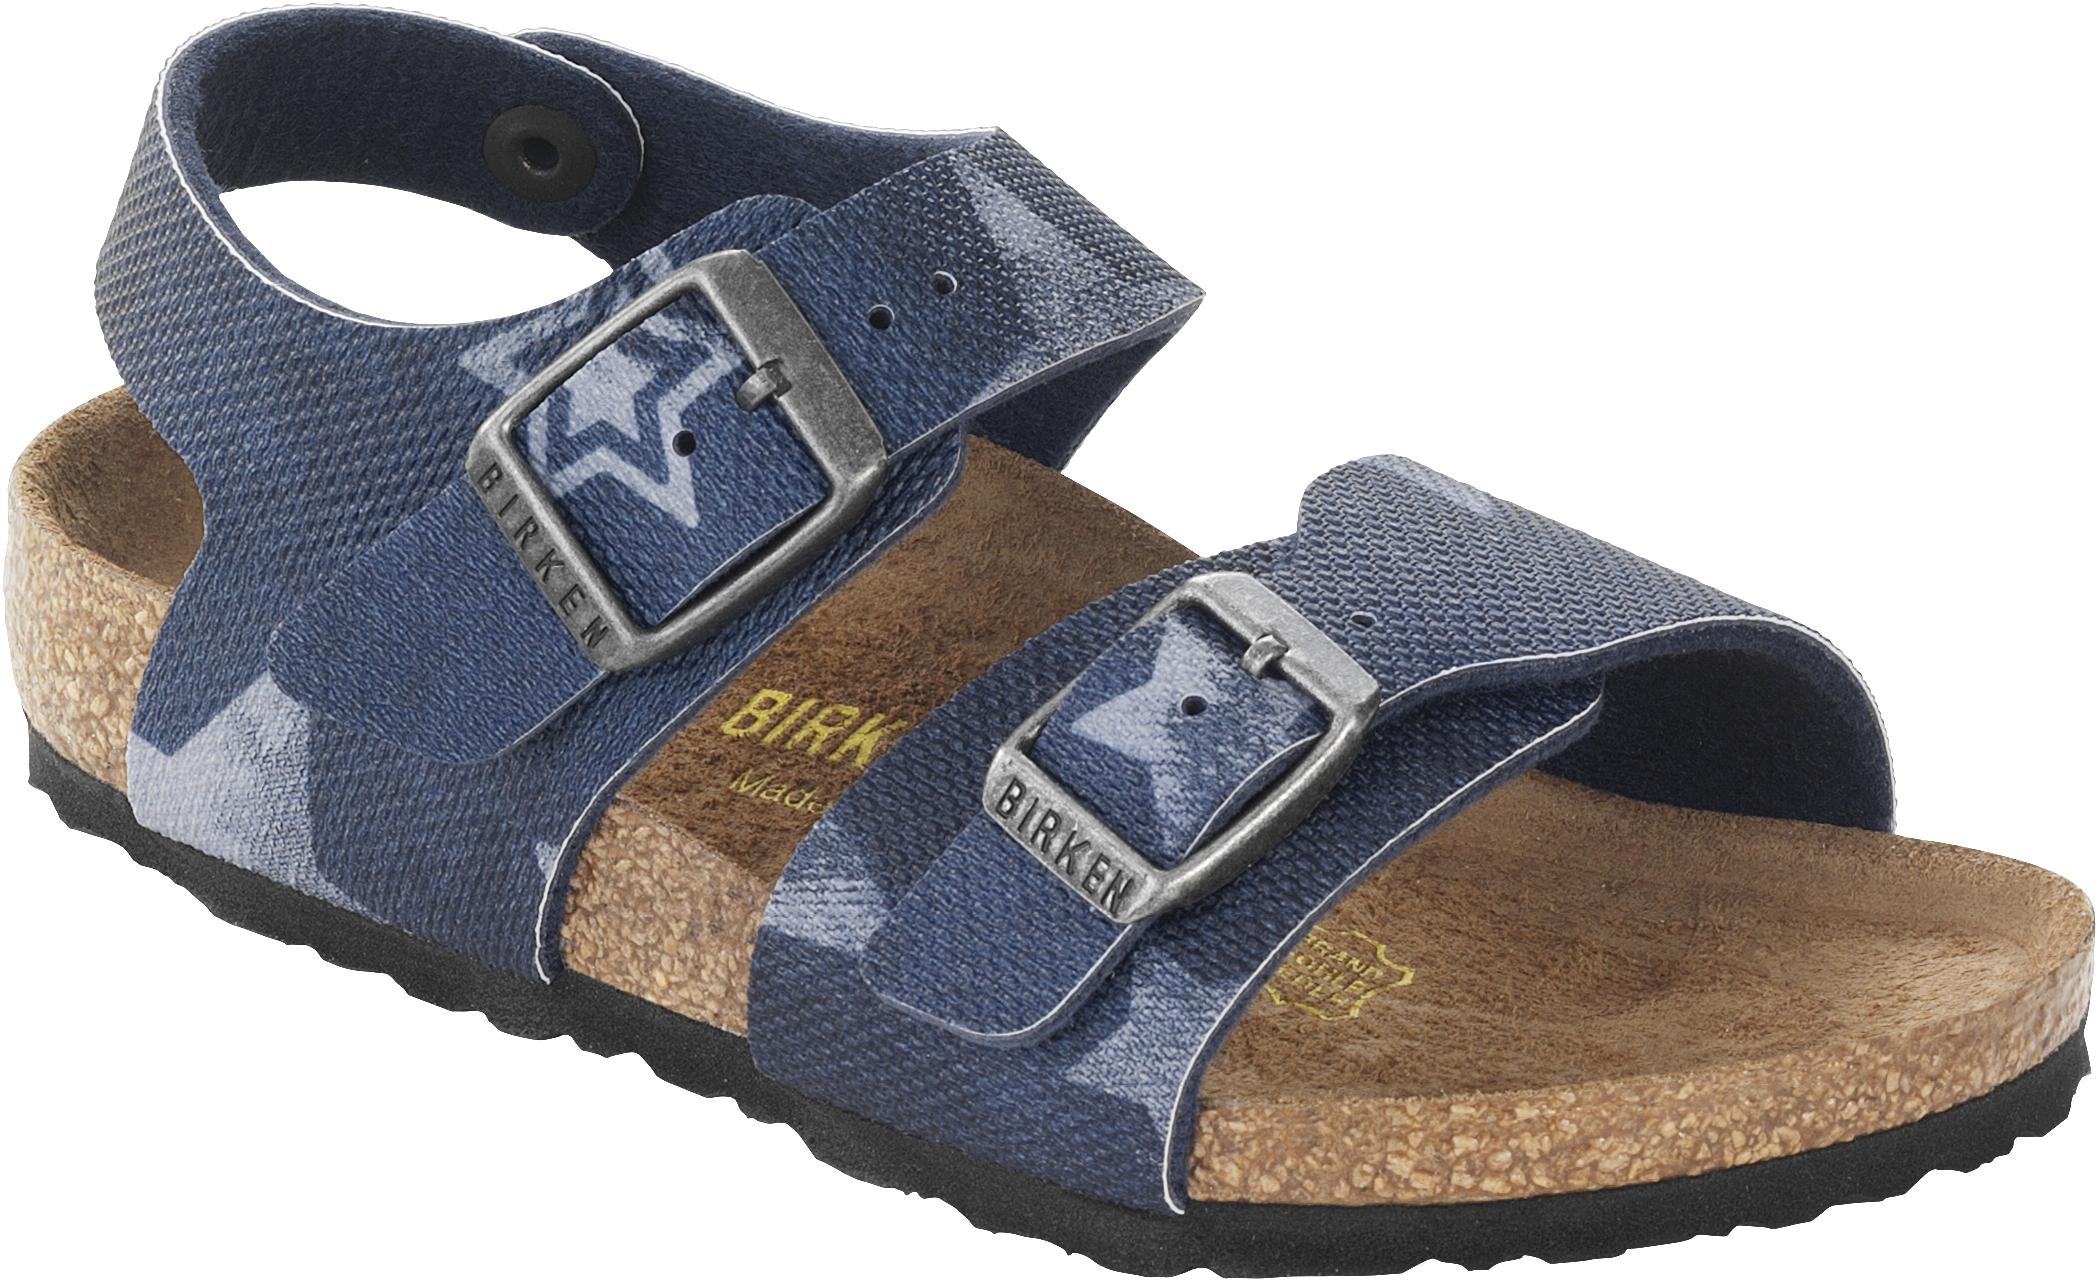 5c31f9fdd293 Birkenstock Sandale New York kids BS vintage stars blue Gr. 24 - 34 089383K